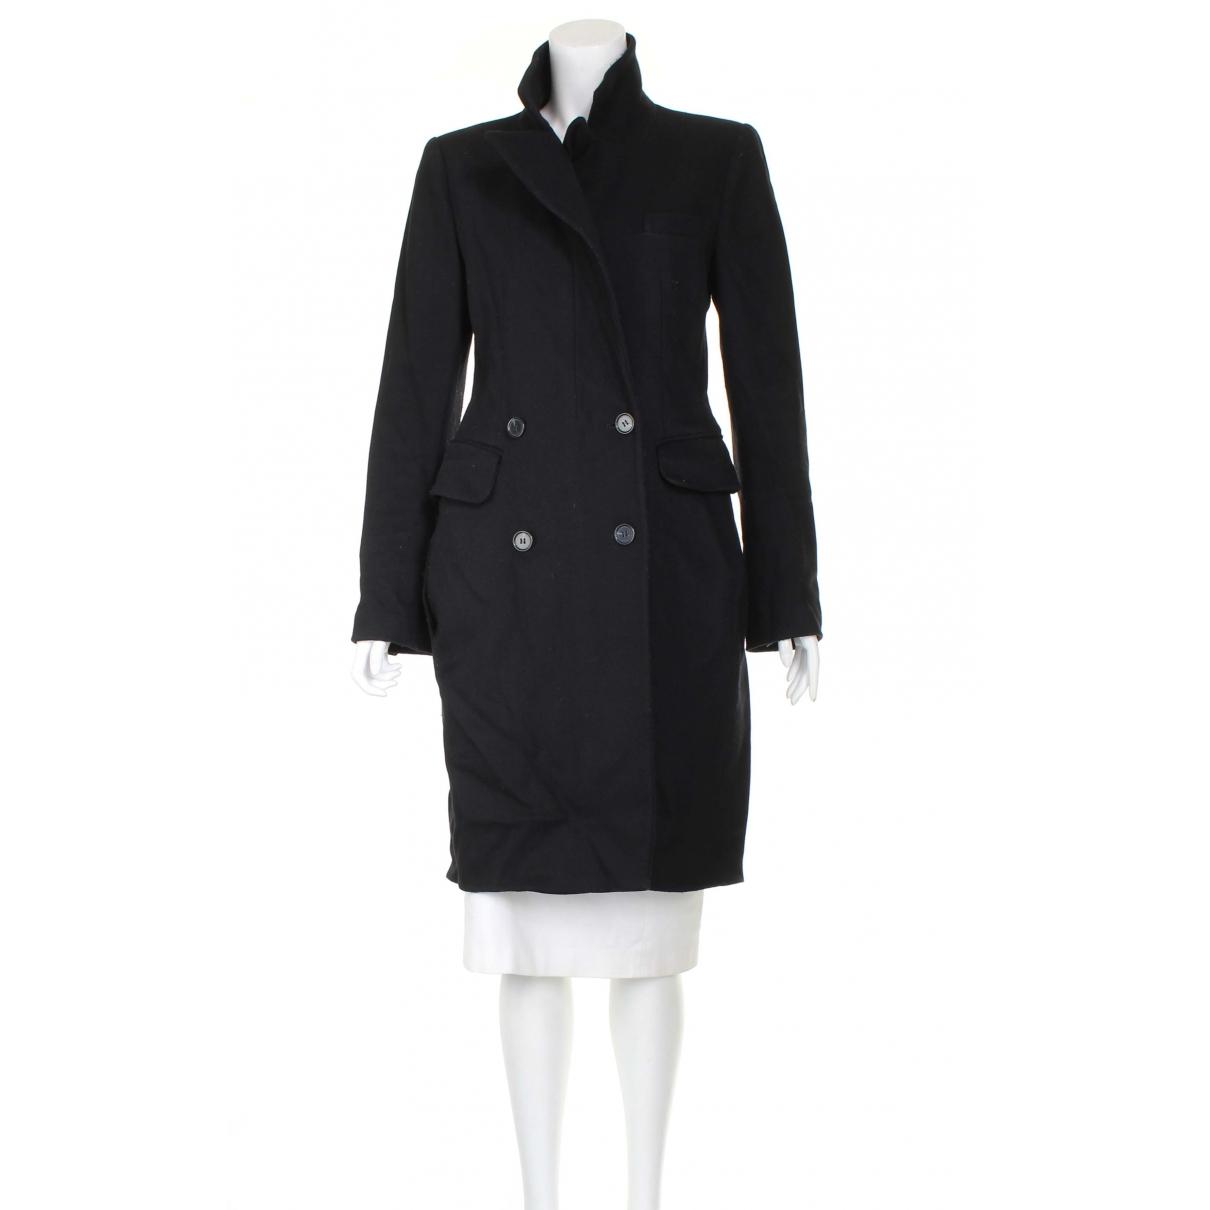 Carven \N Black Wool coat for Women 36 FR